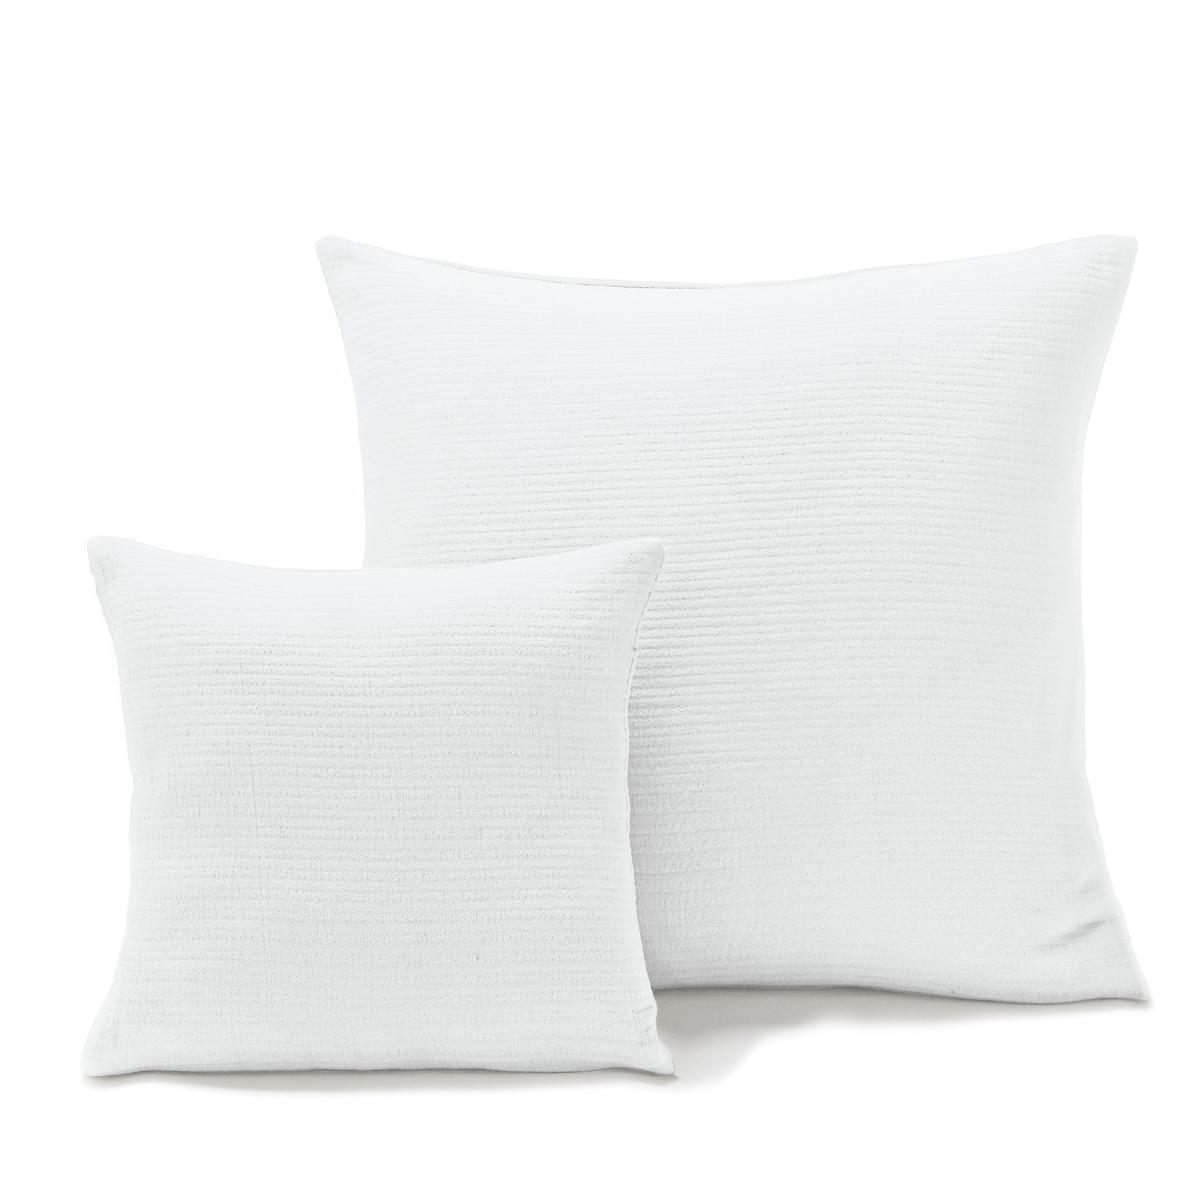 Чехол на подушку IlhowХарактеристики чехла на подушку Ilhow :- 100% хлопок.- Застежка на молнию.<br><br>Цвет: белый,желтый горчичный,зеленый,серо-бежевый,серый<br>Размер: 40 x 40  см.65 x 65  см.65 x 65  см.65 x 65  см